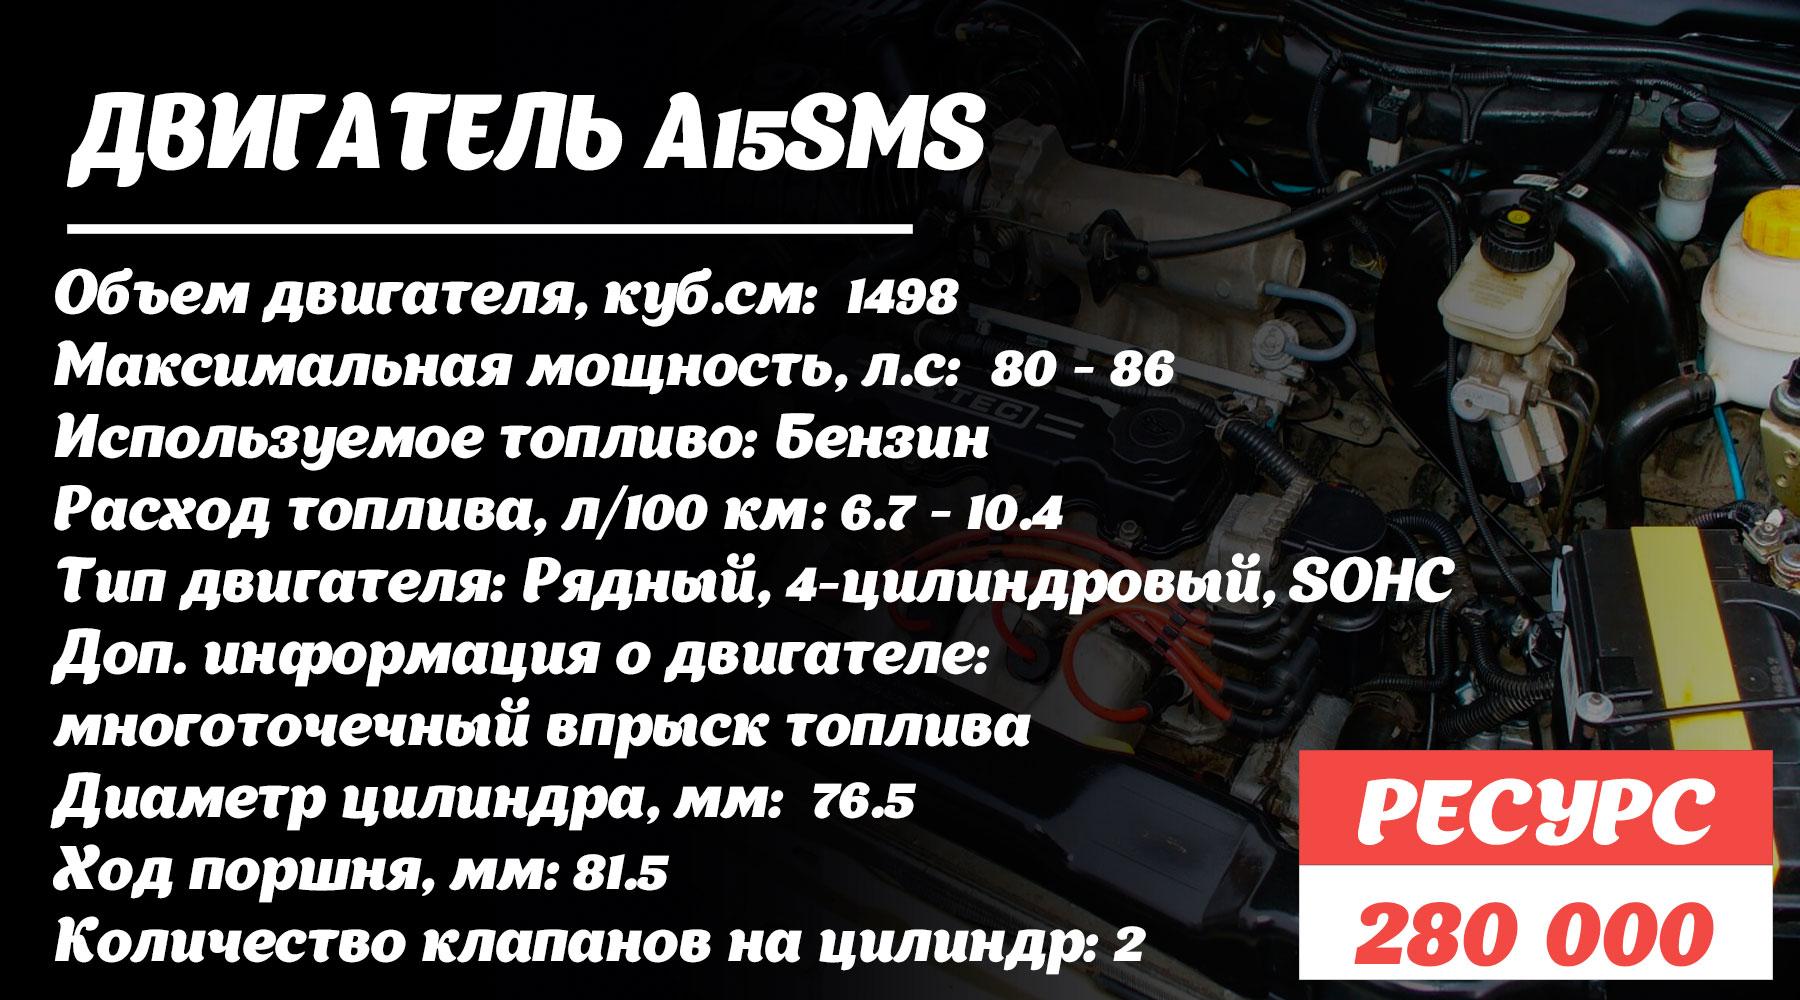 Ресурс двигателя A15SMS